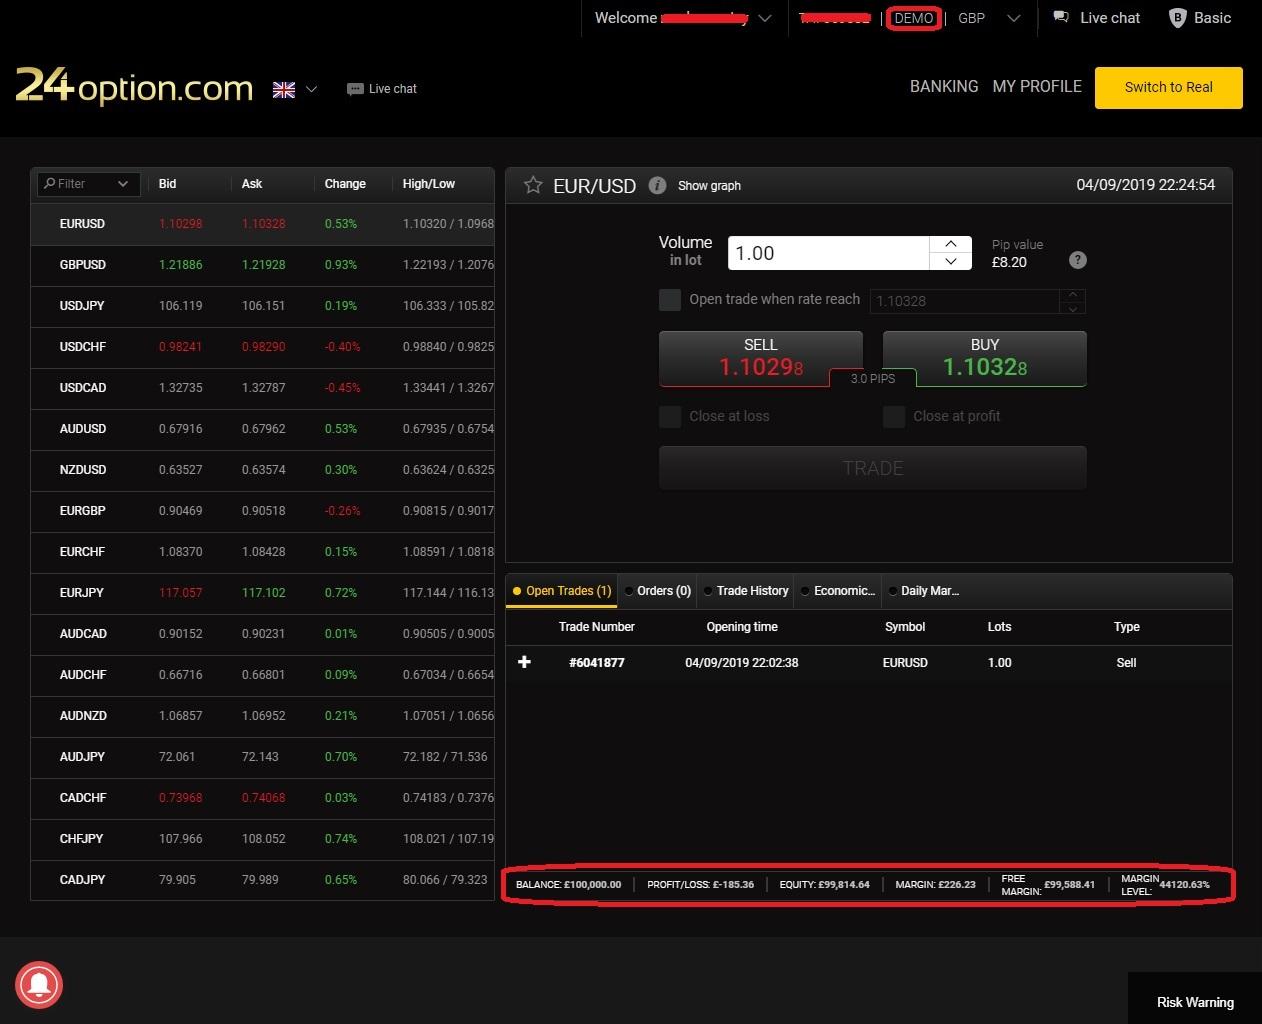 24option demo account virtual funds